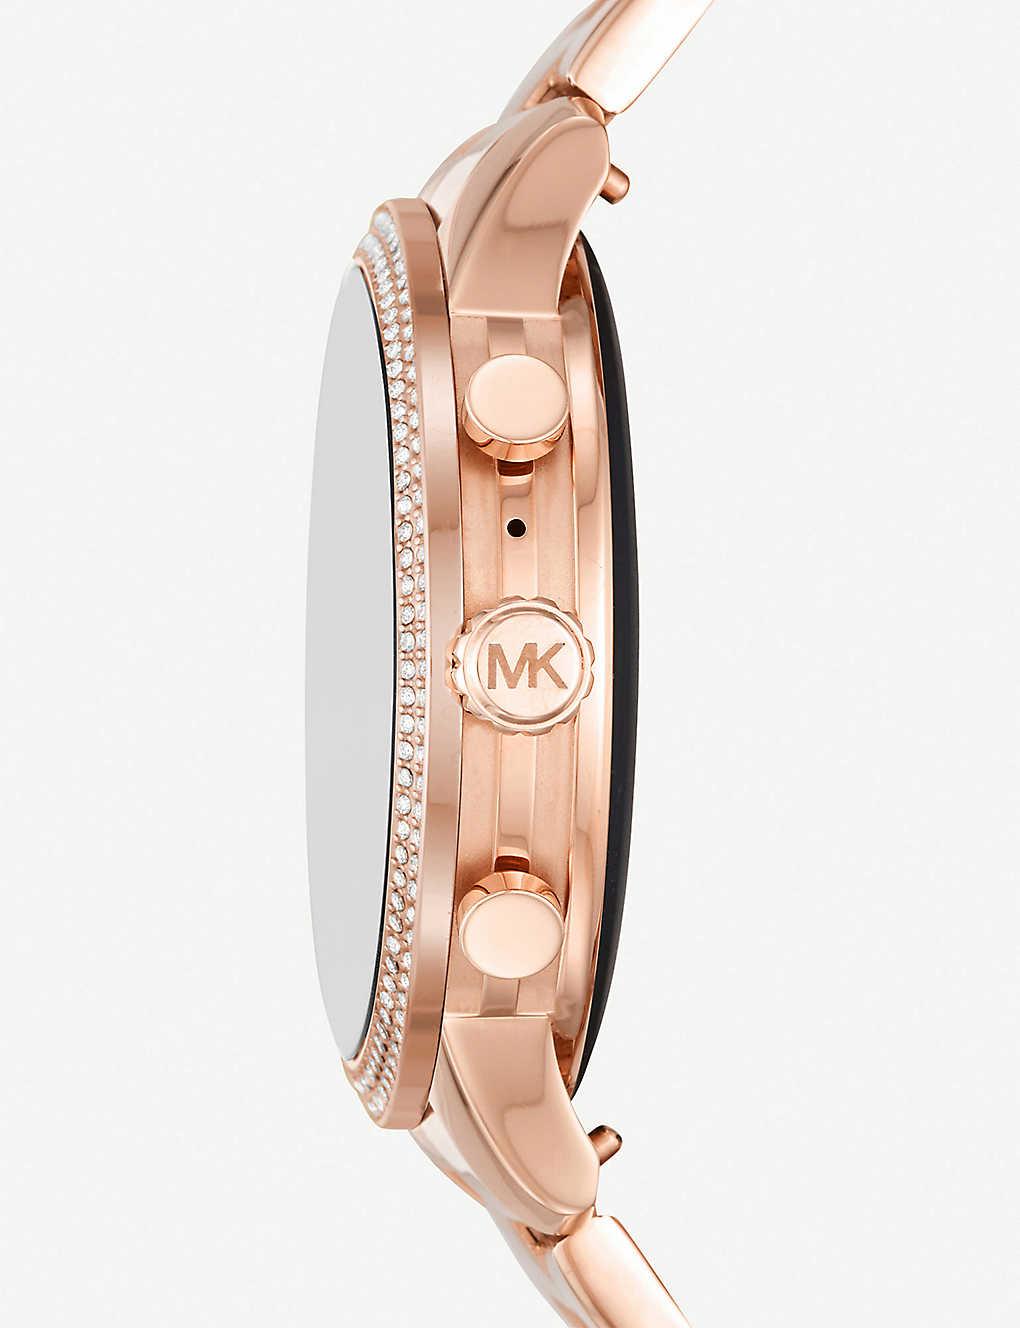 c2411aa17fa3 MICHAEL KORS - MKT5052 Runway Pavé stainless steel smartwatch ...